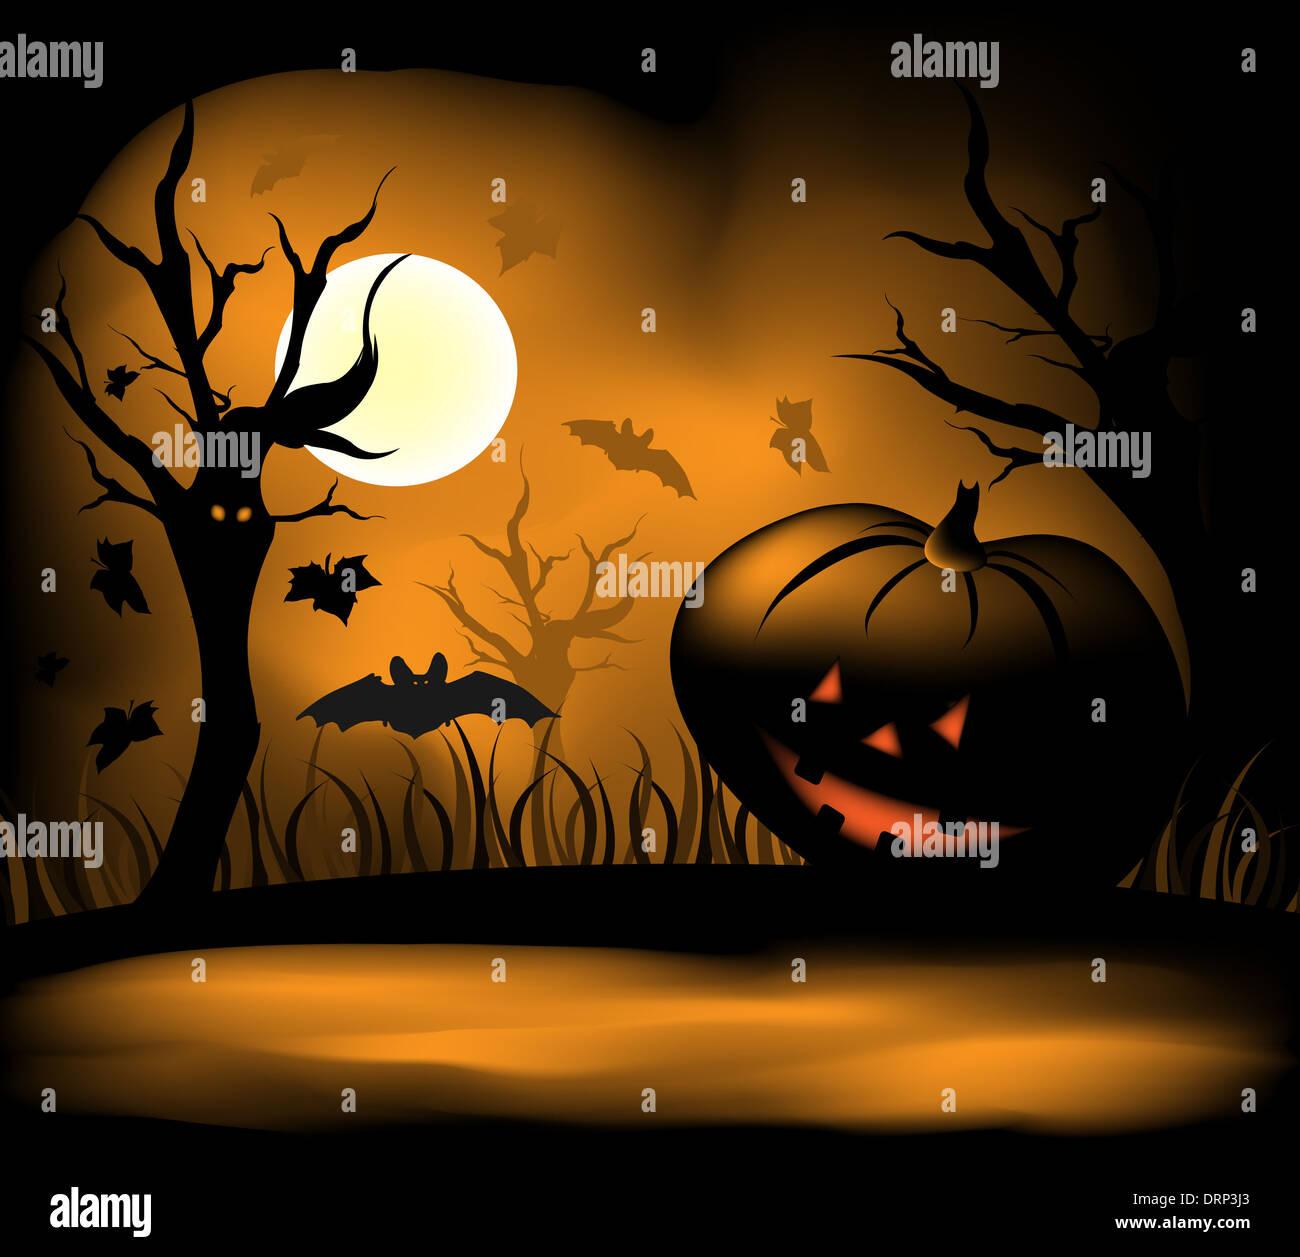 Halloween background - Stock Image